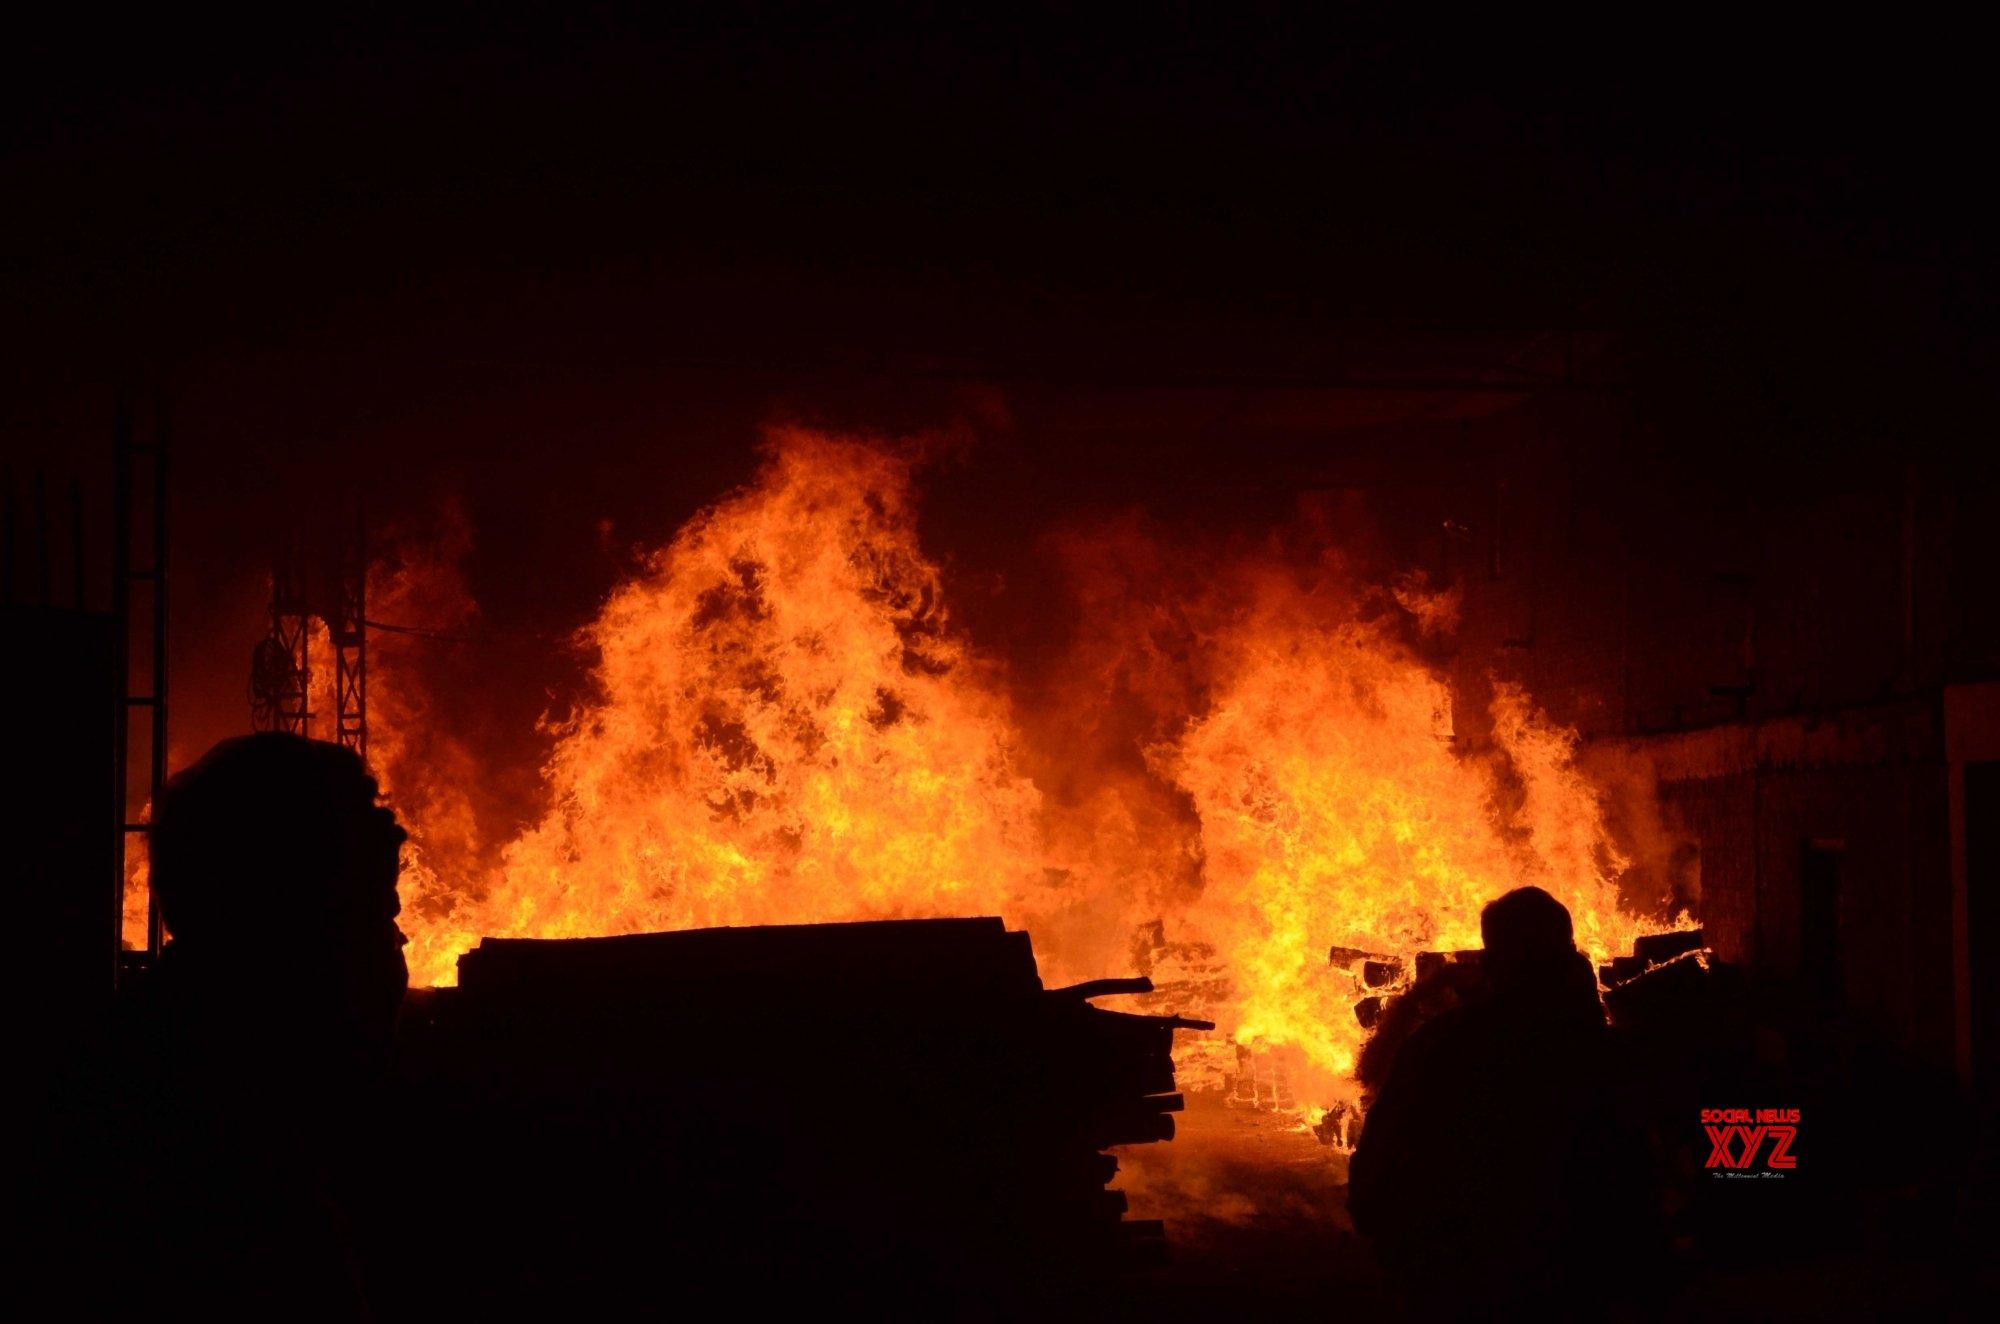 11 die in Rio hospital fire